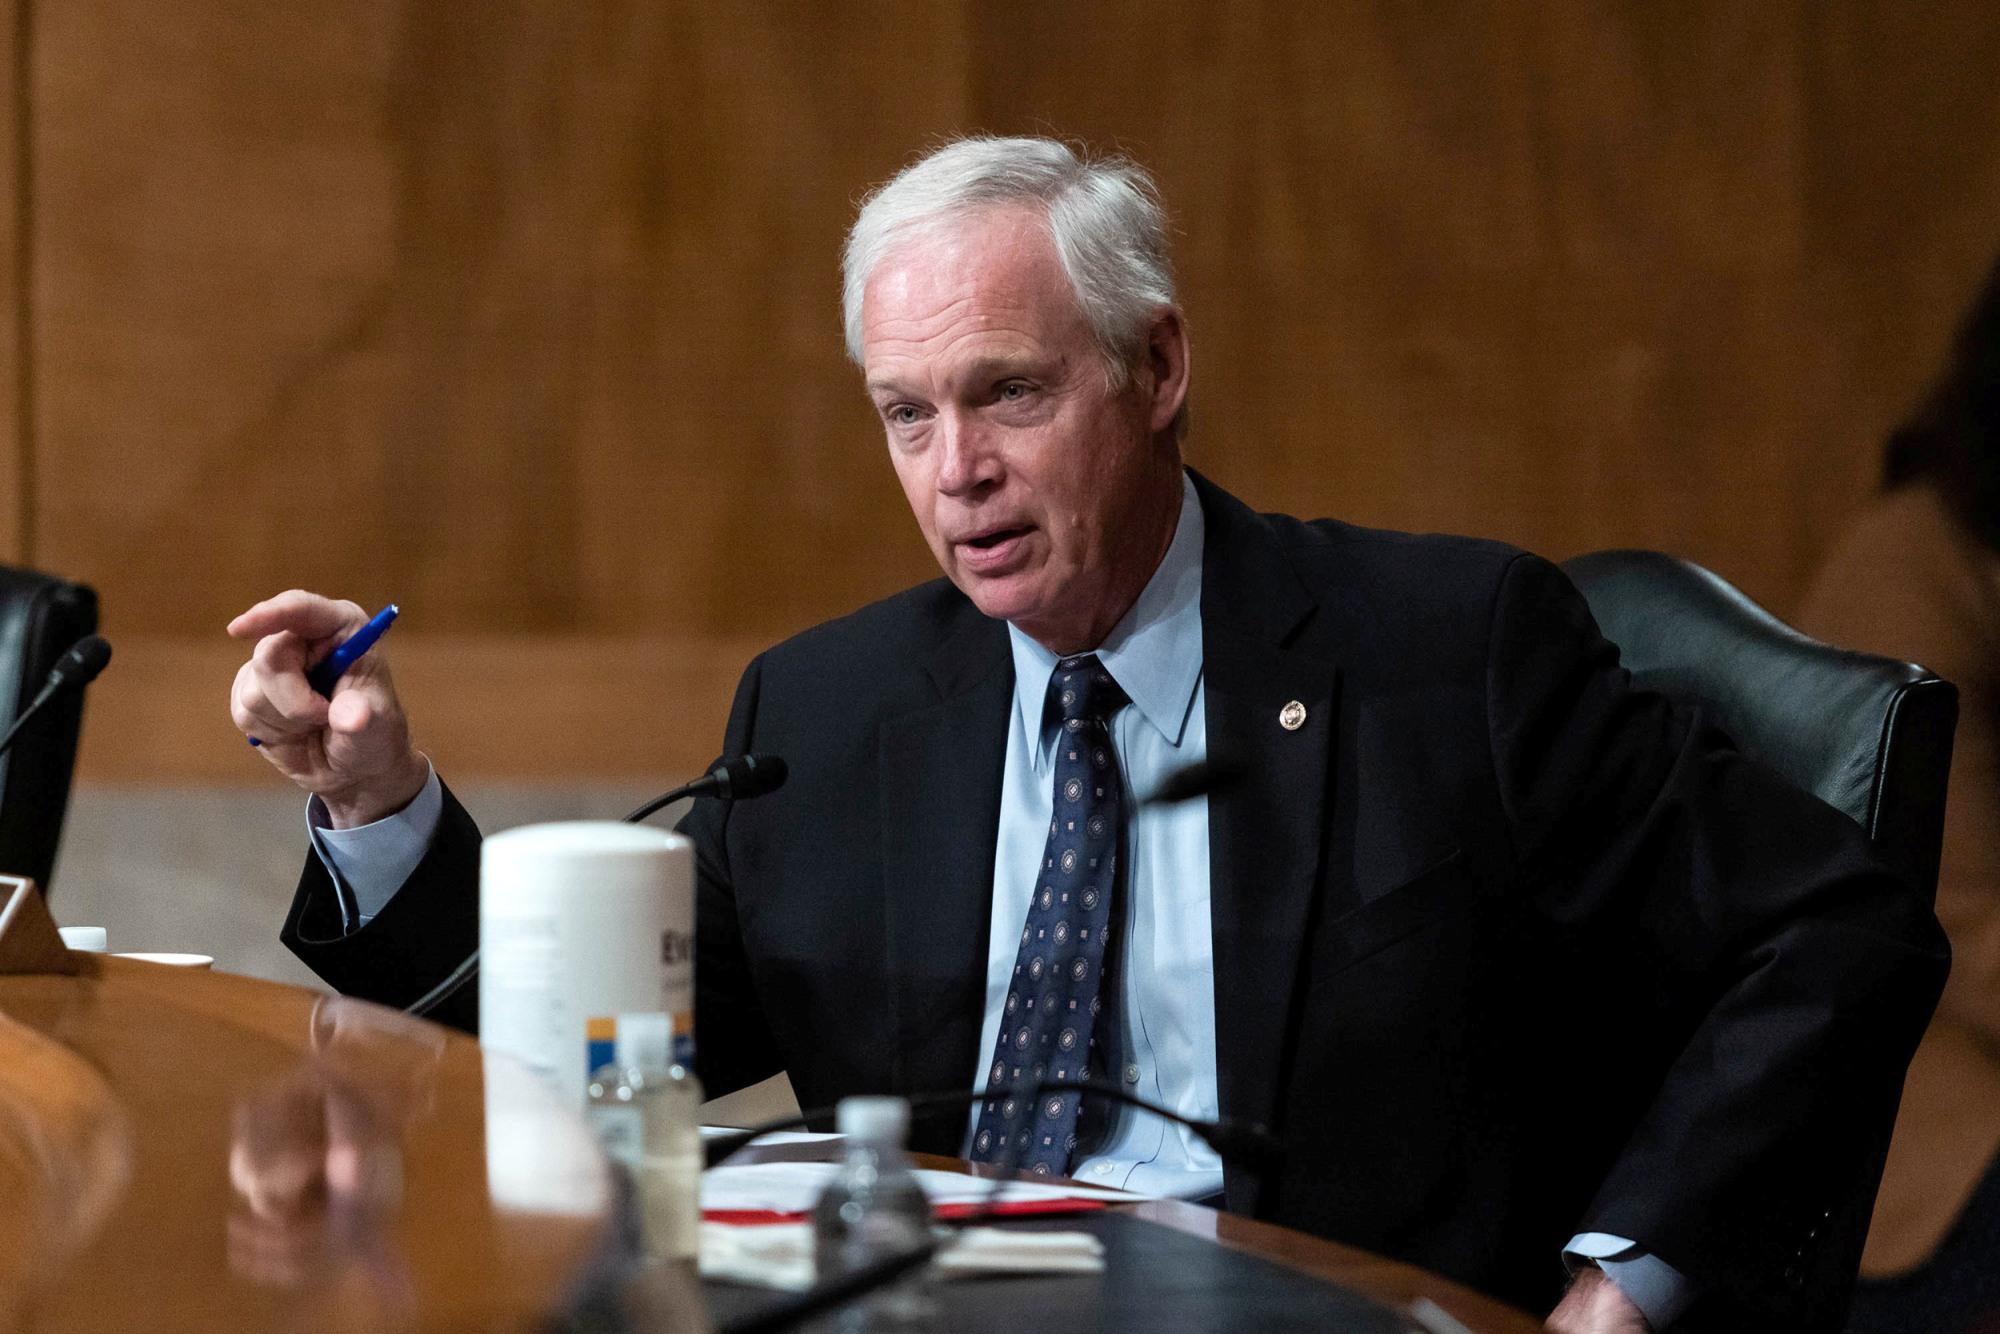 YouTube Suspends GOP Sen. Ron Johnson's Account for a Week Over Video Violating Coronavirus Misinformation Policies